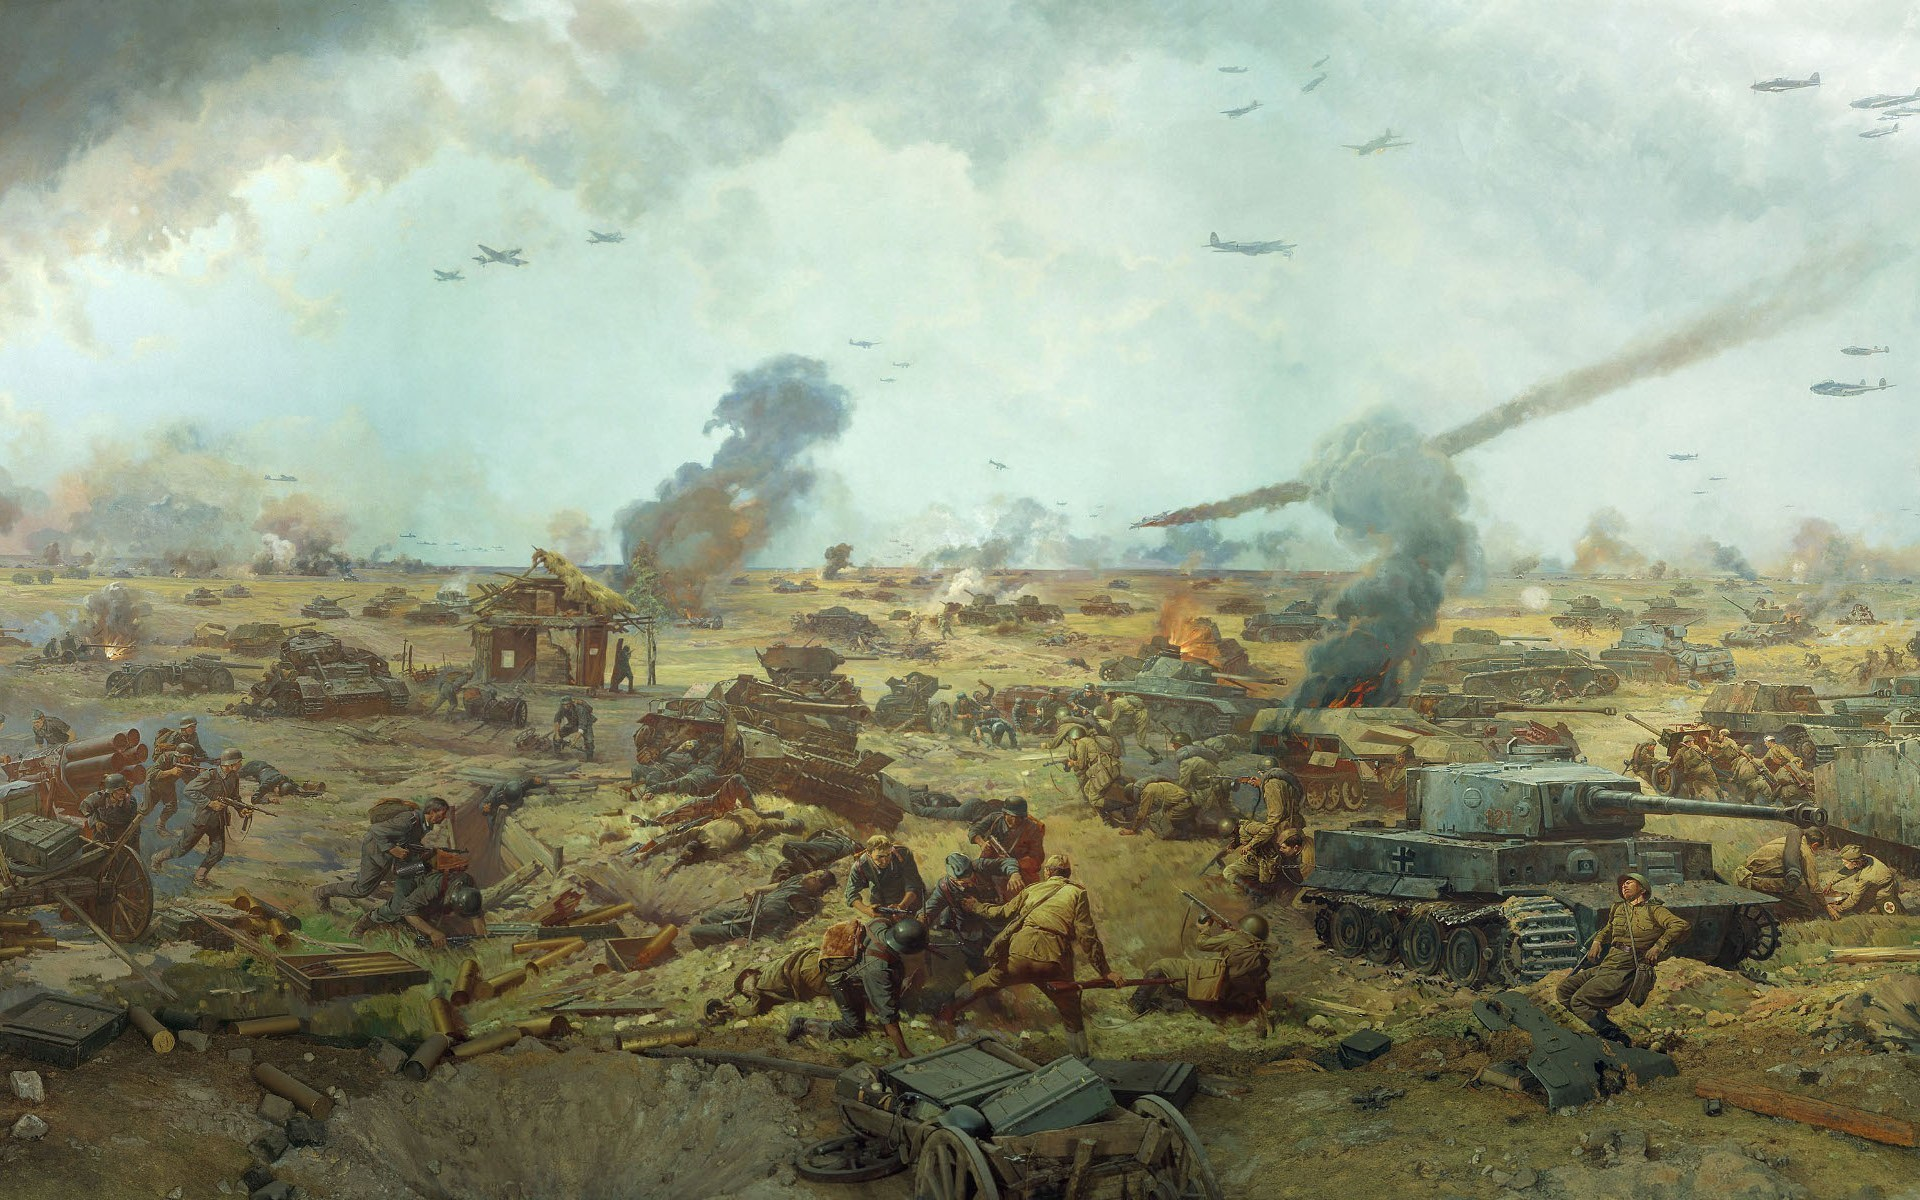 ww2 german army wallpaper - photo #45